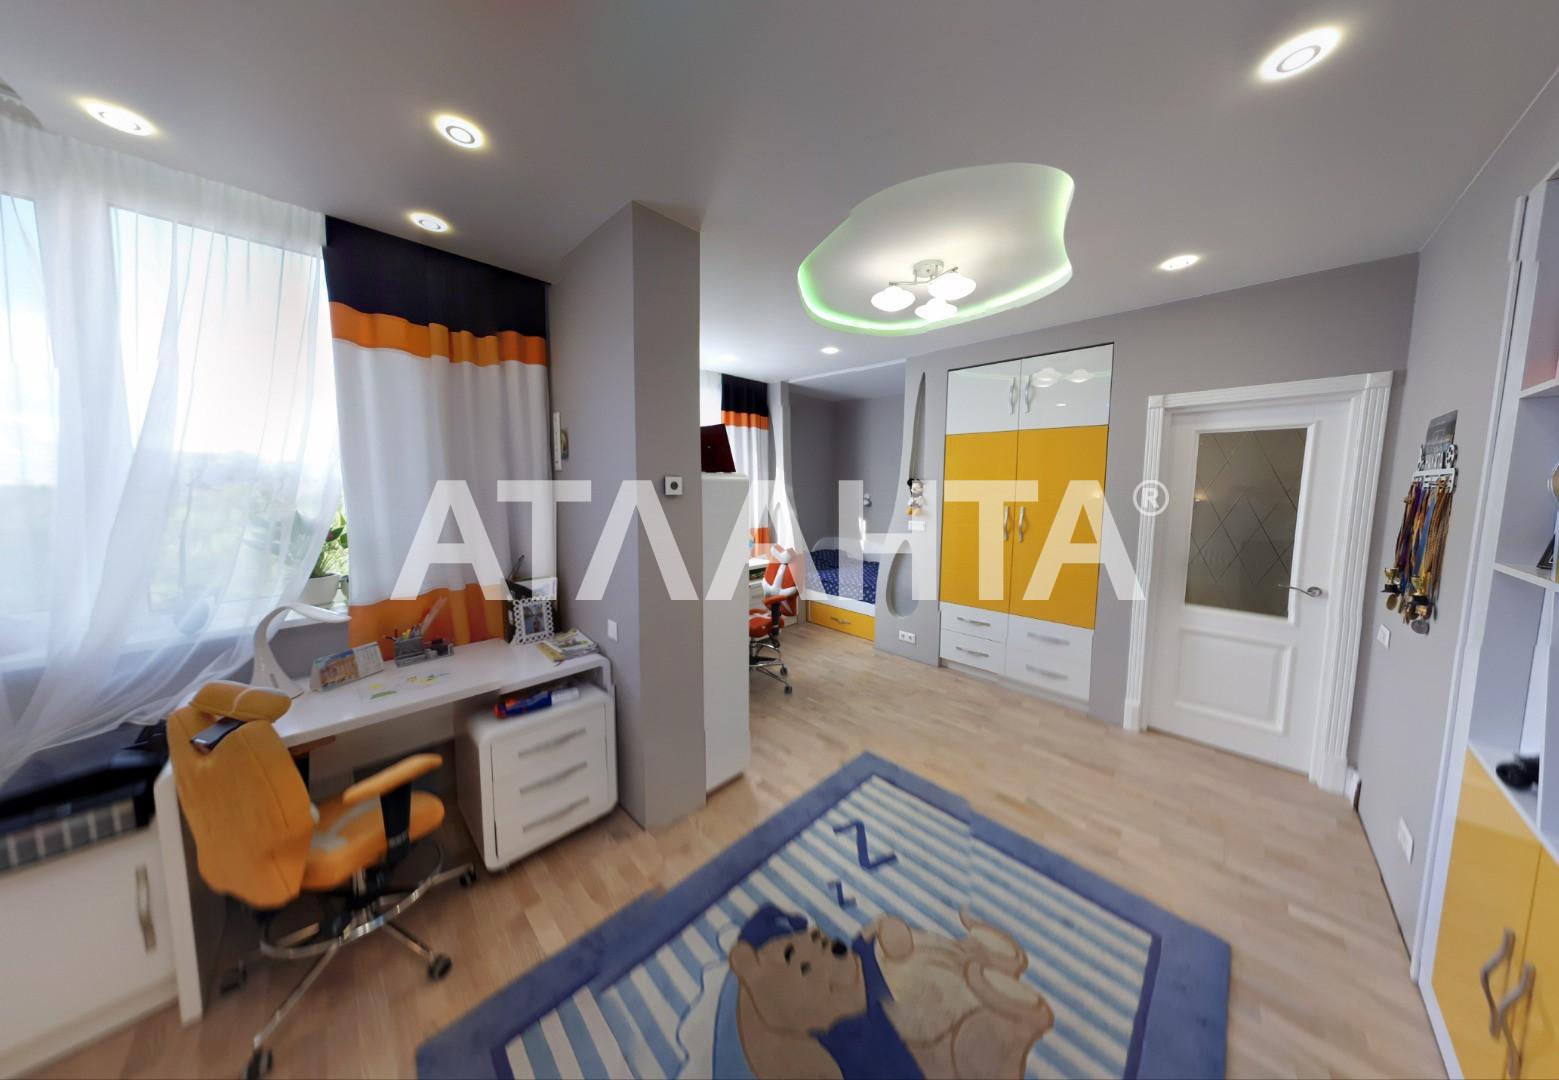 Продается 3-комнатная Квартира на ул. Ул. Ломоносова — 230 000 у.е. (фото №8)